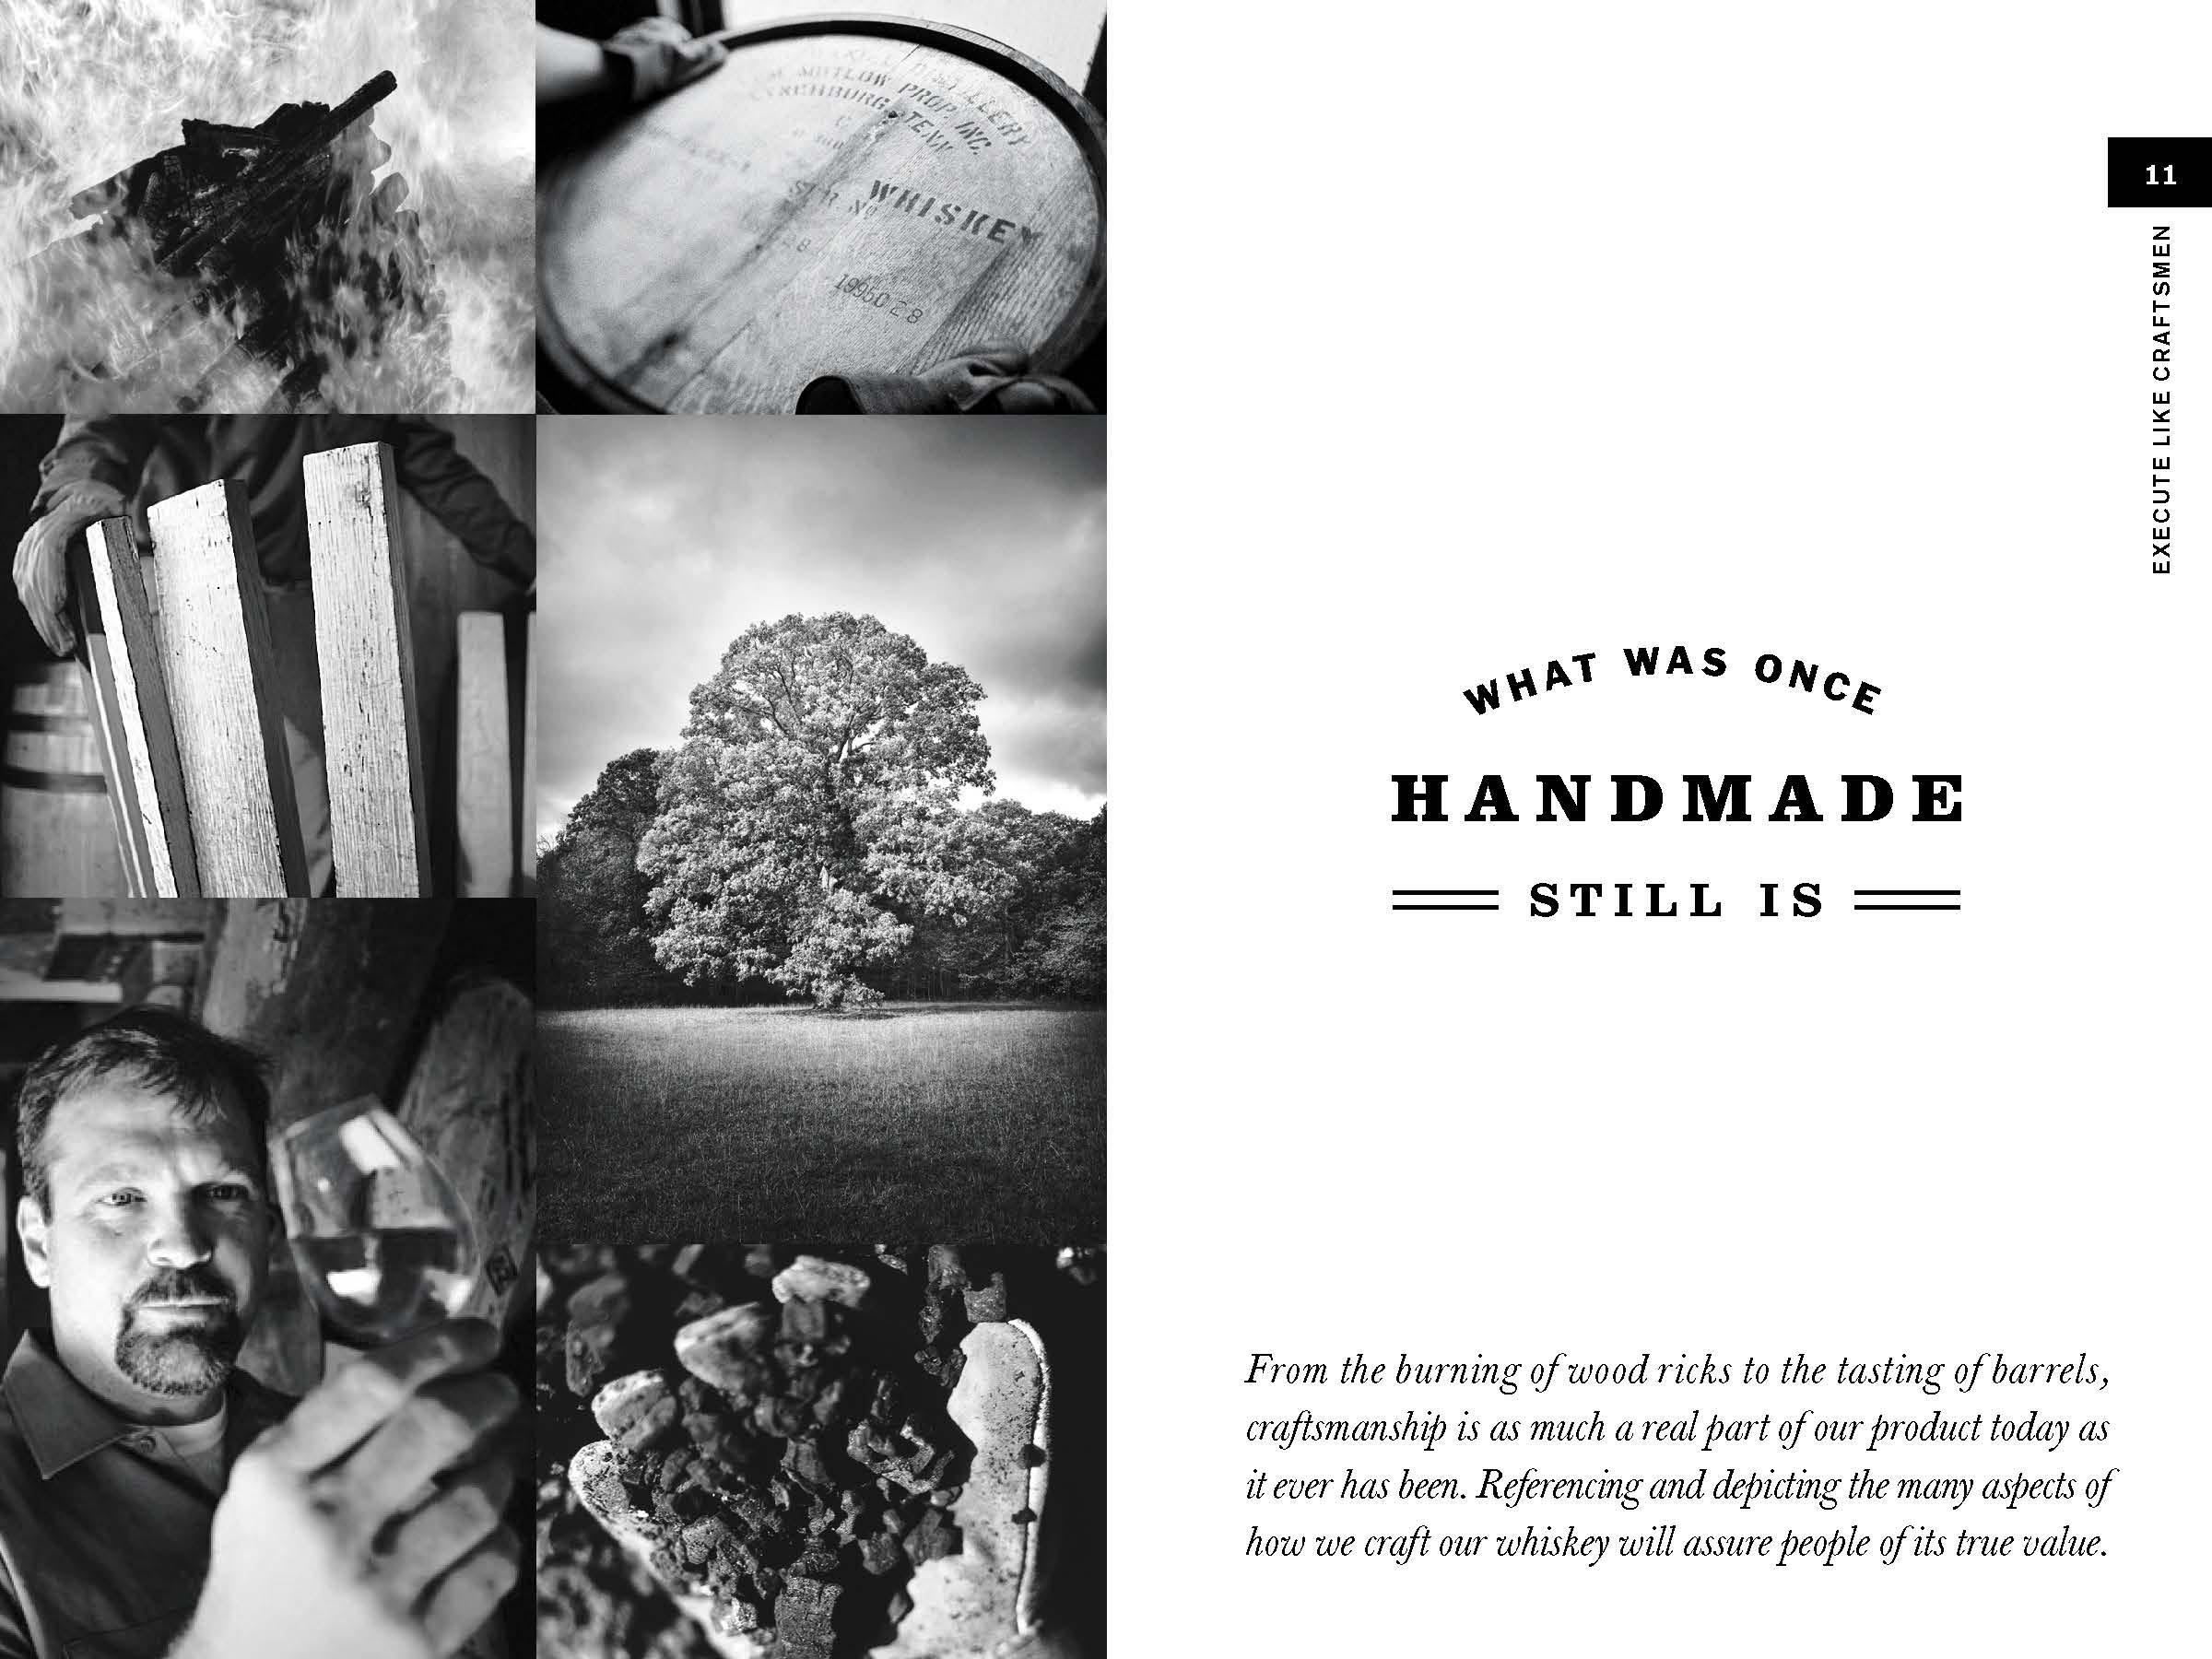 Jack Daniel's Guiding Principles 2012_Page_09.jpg